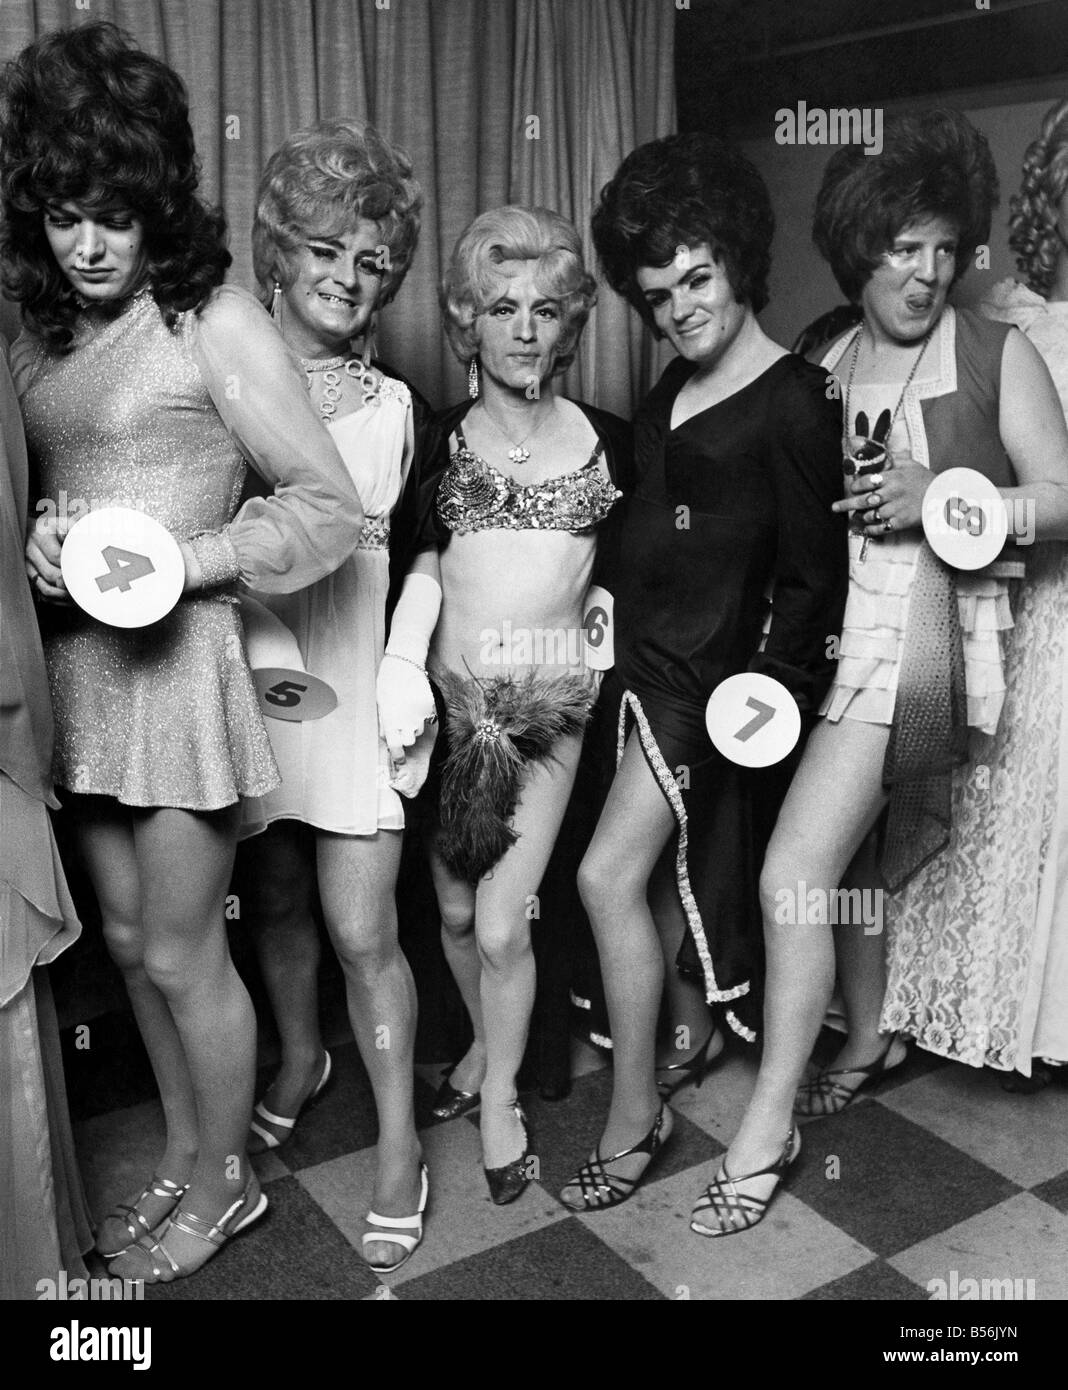 Female contest Nude Photos 30